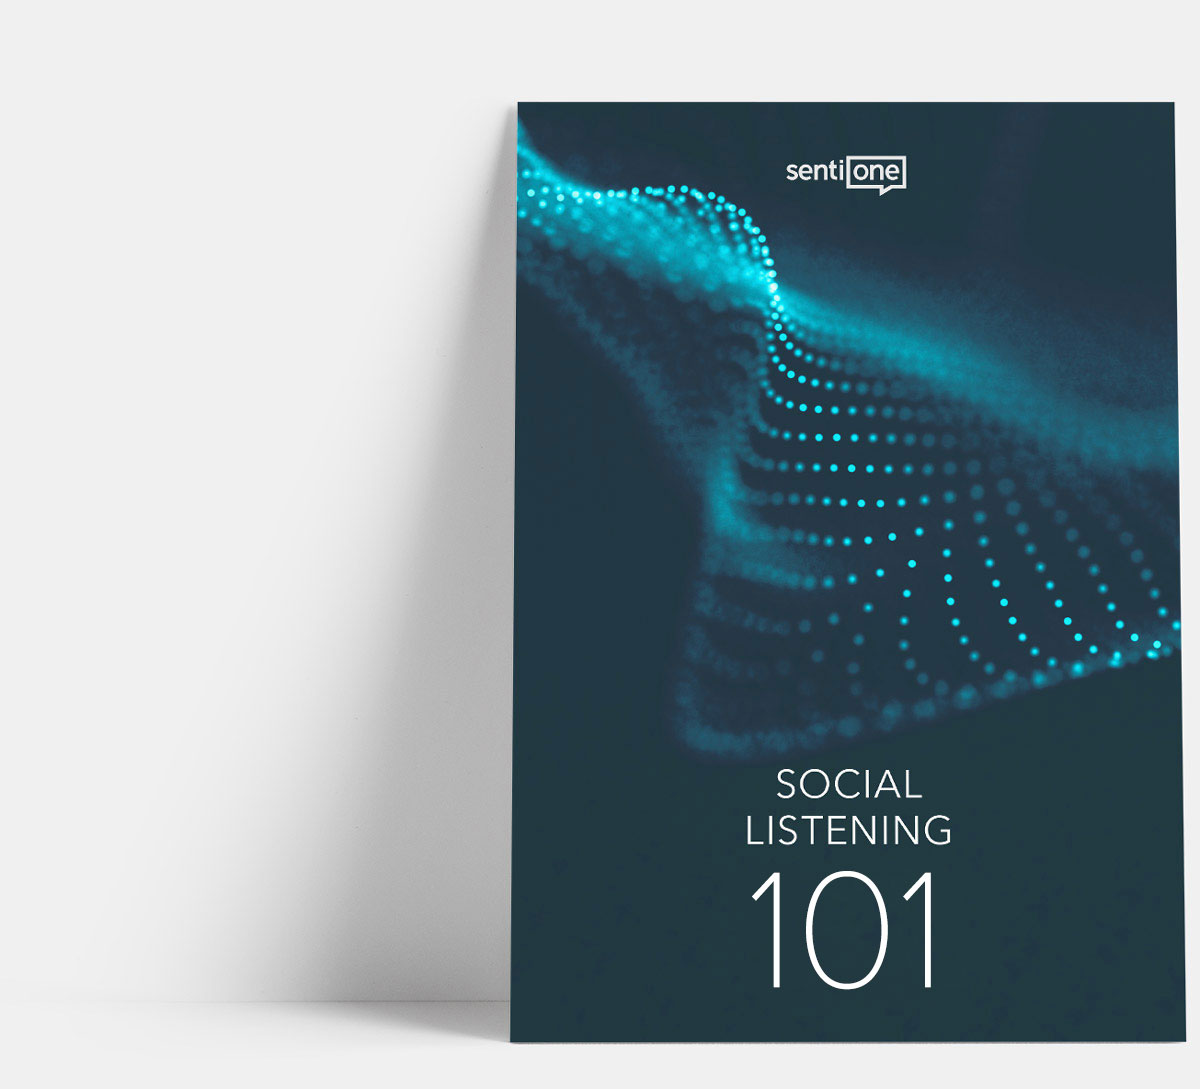 Social Listening 101 cover